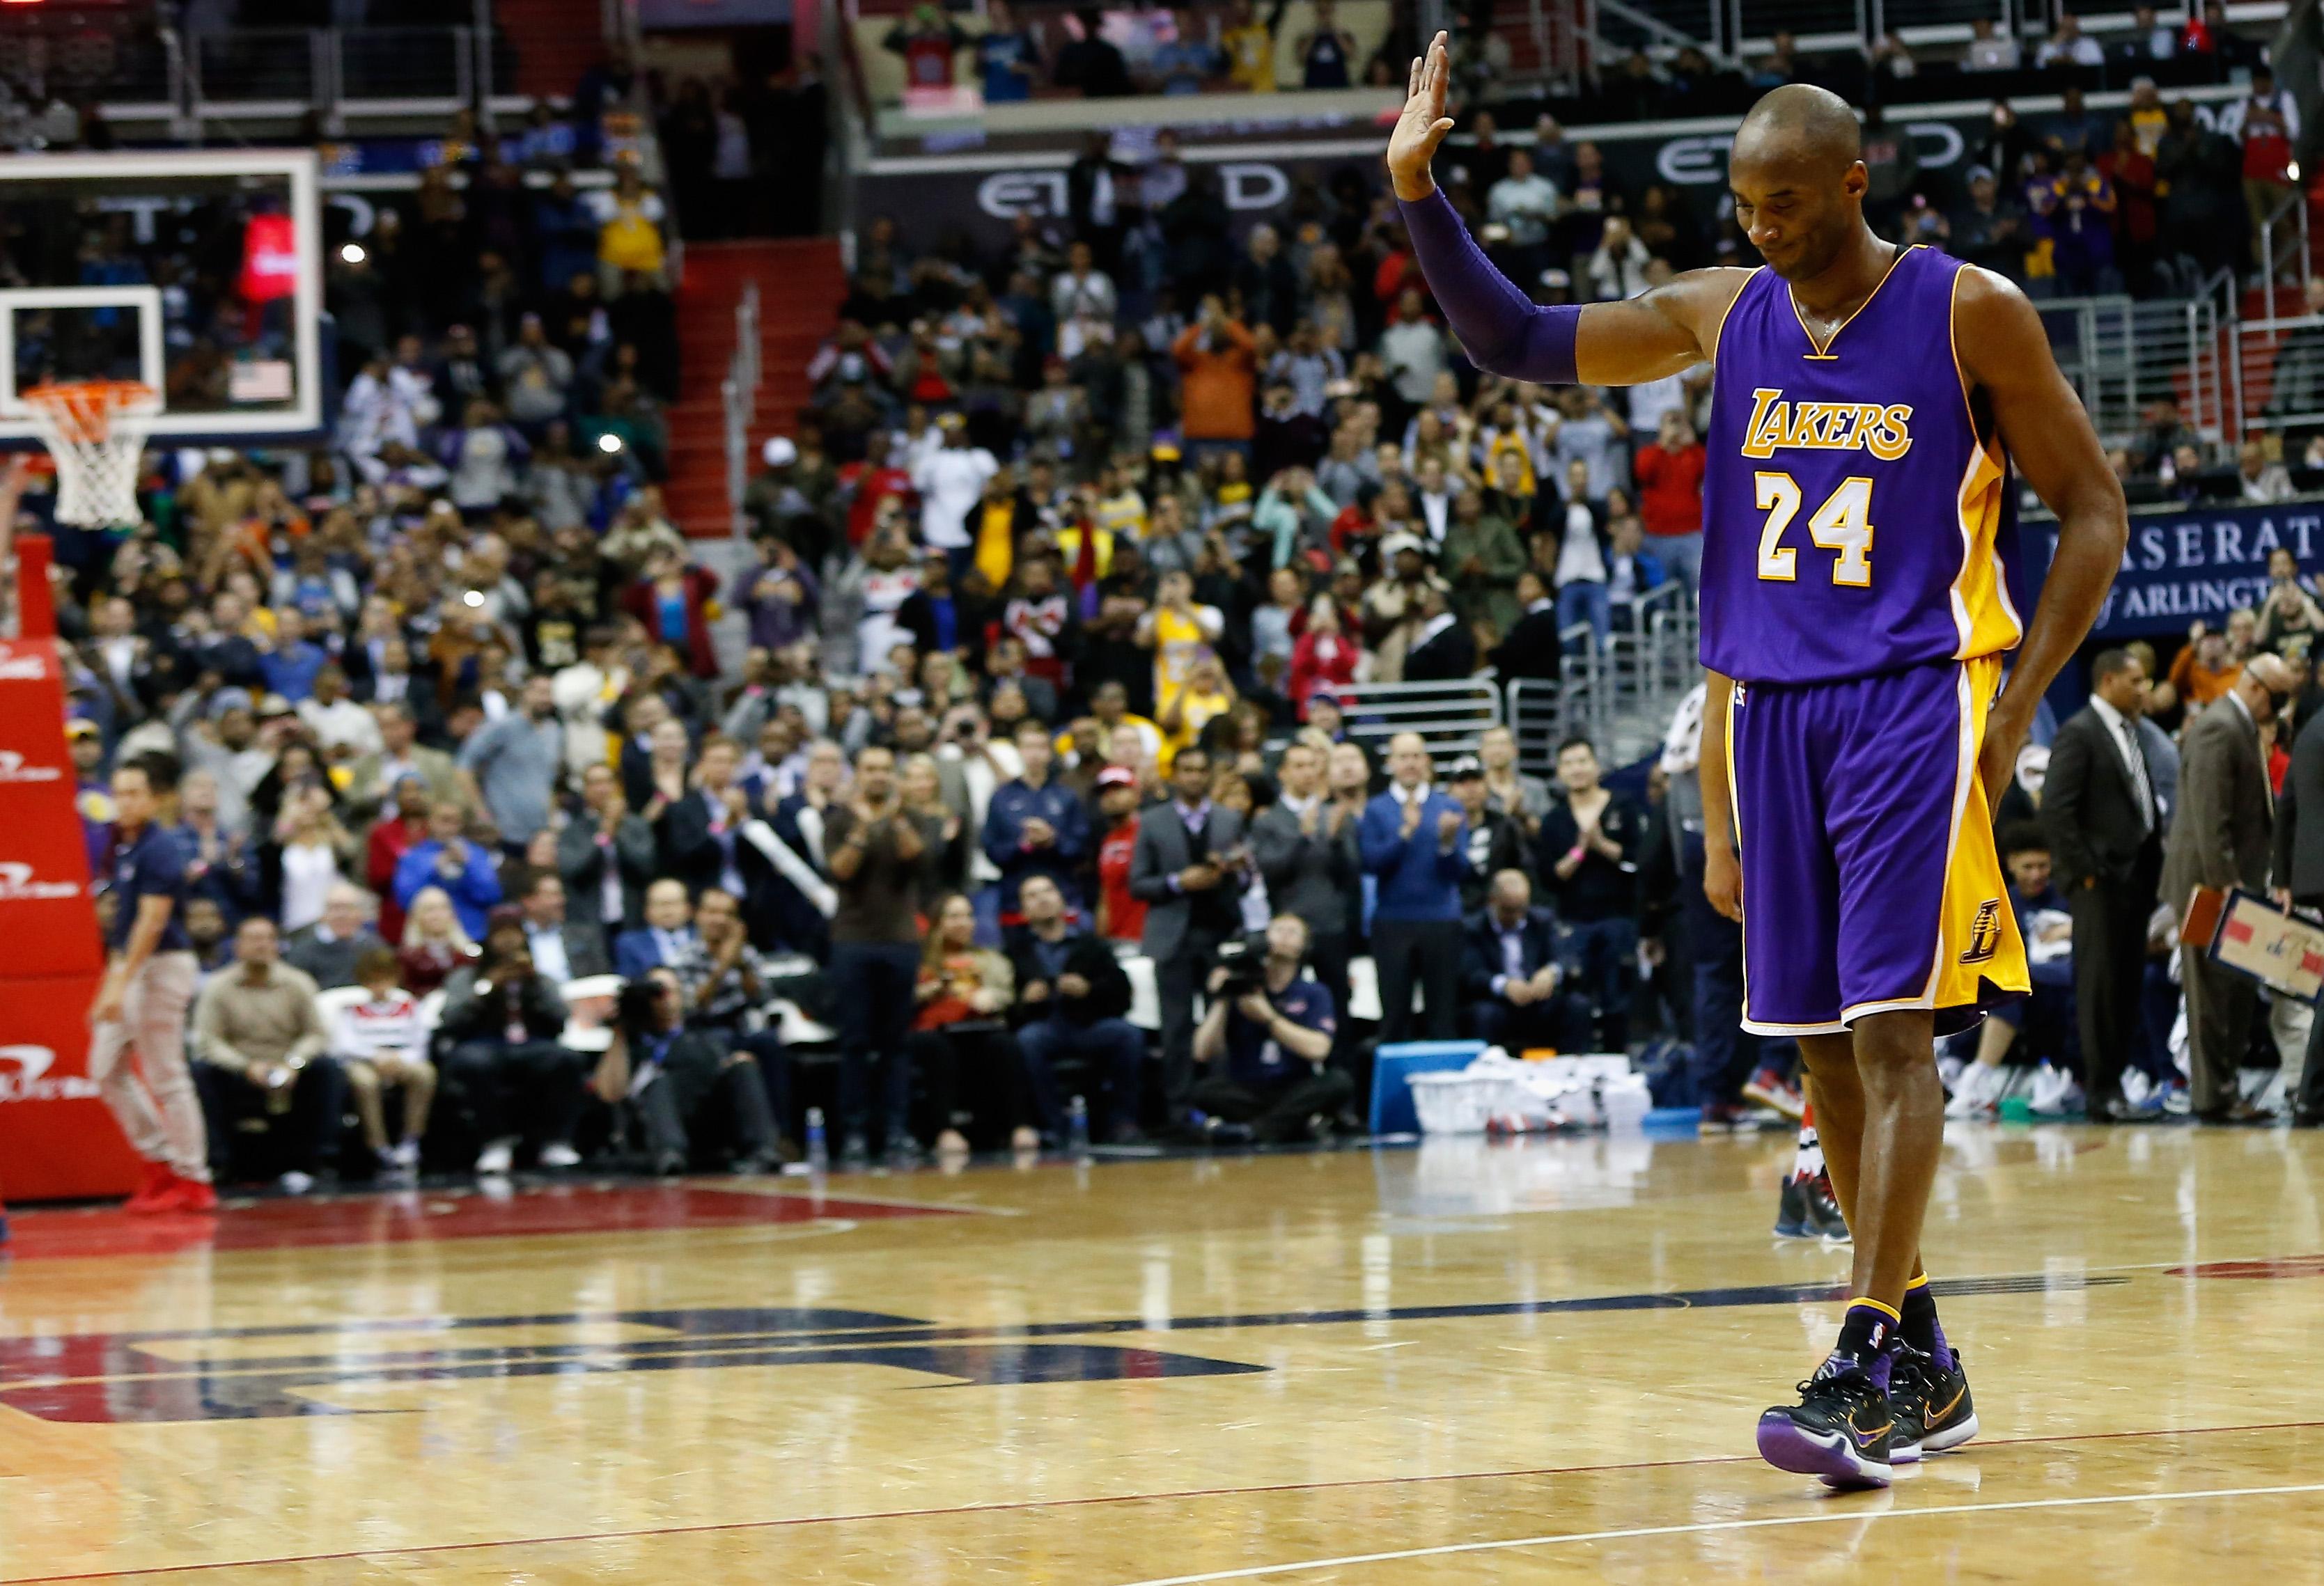 NBA洛杉磯湖人隊的傳奇巨星柯比·布萊恩(Kobe  Bryant),2016年4月14日退休。Kobe最後一戰對猶他爵士獨得60分,在他為洛杉磯湖人效力的20年職業生涯中,總得分達到33,643分,位居NBA歷史第三位,並取得五次總冠軍,兩次總決賽最有價值球員,一次年度最有價值球員,兩次得分王。(Getty Images)